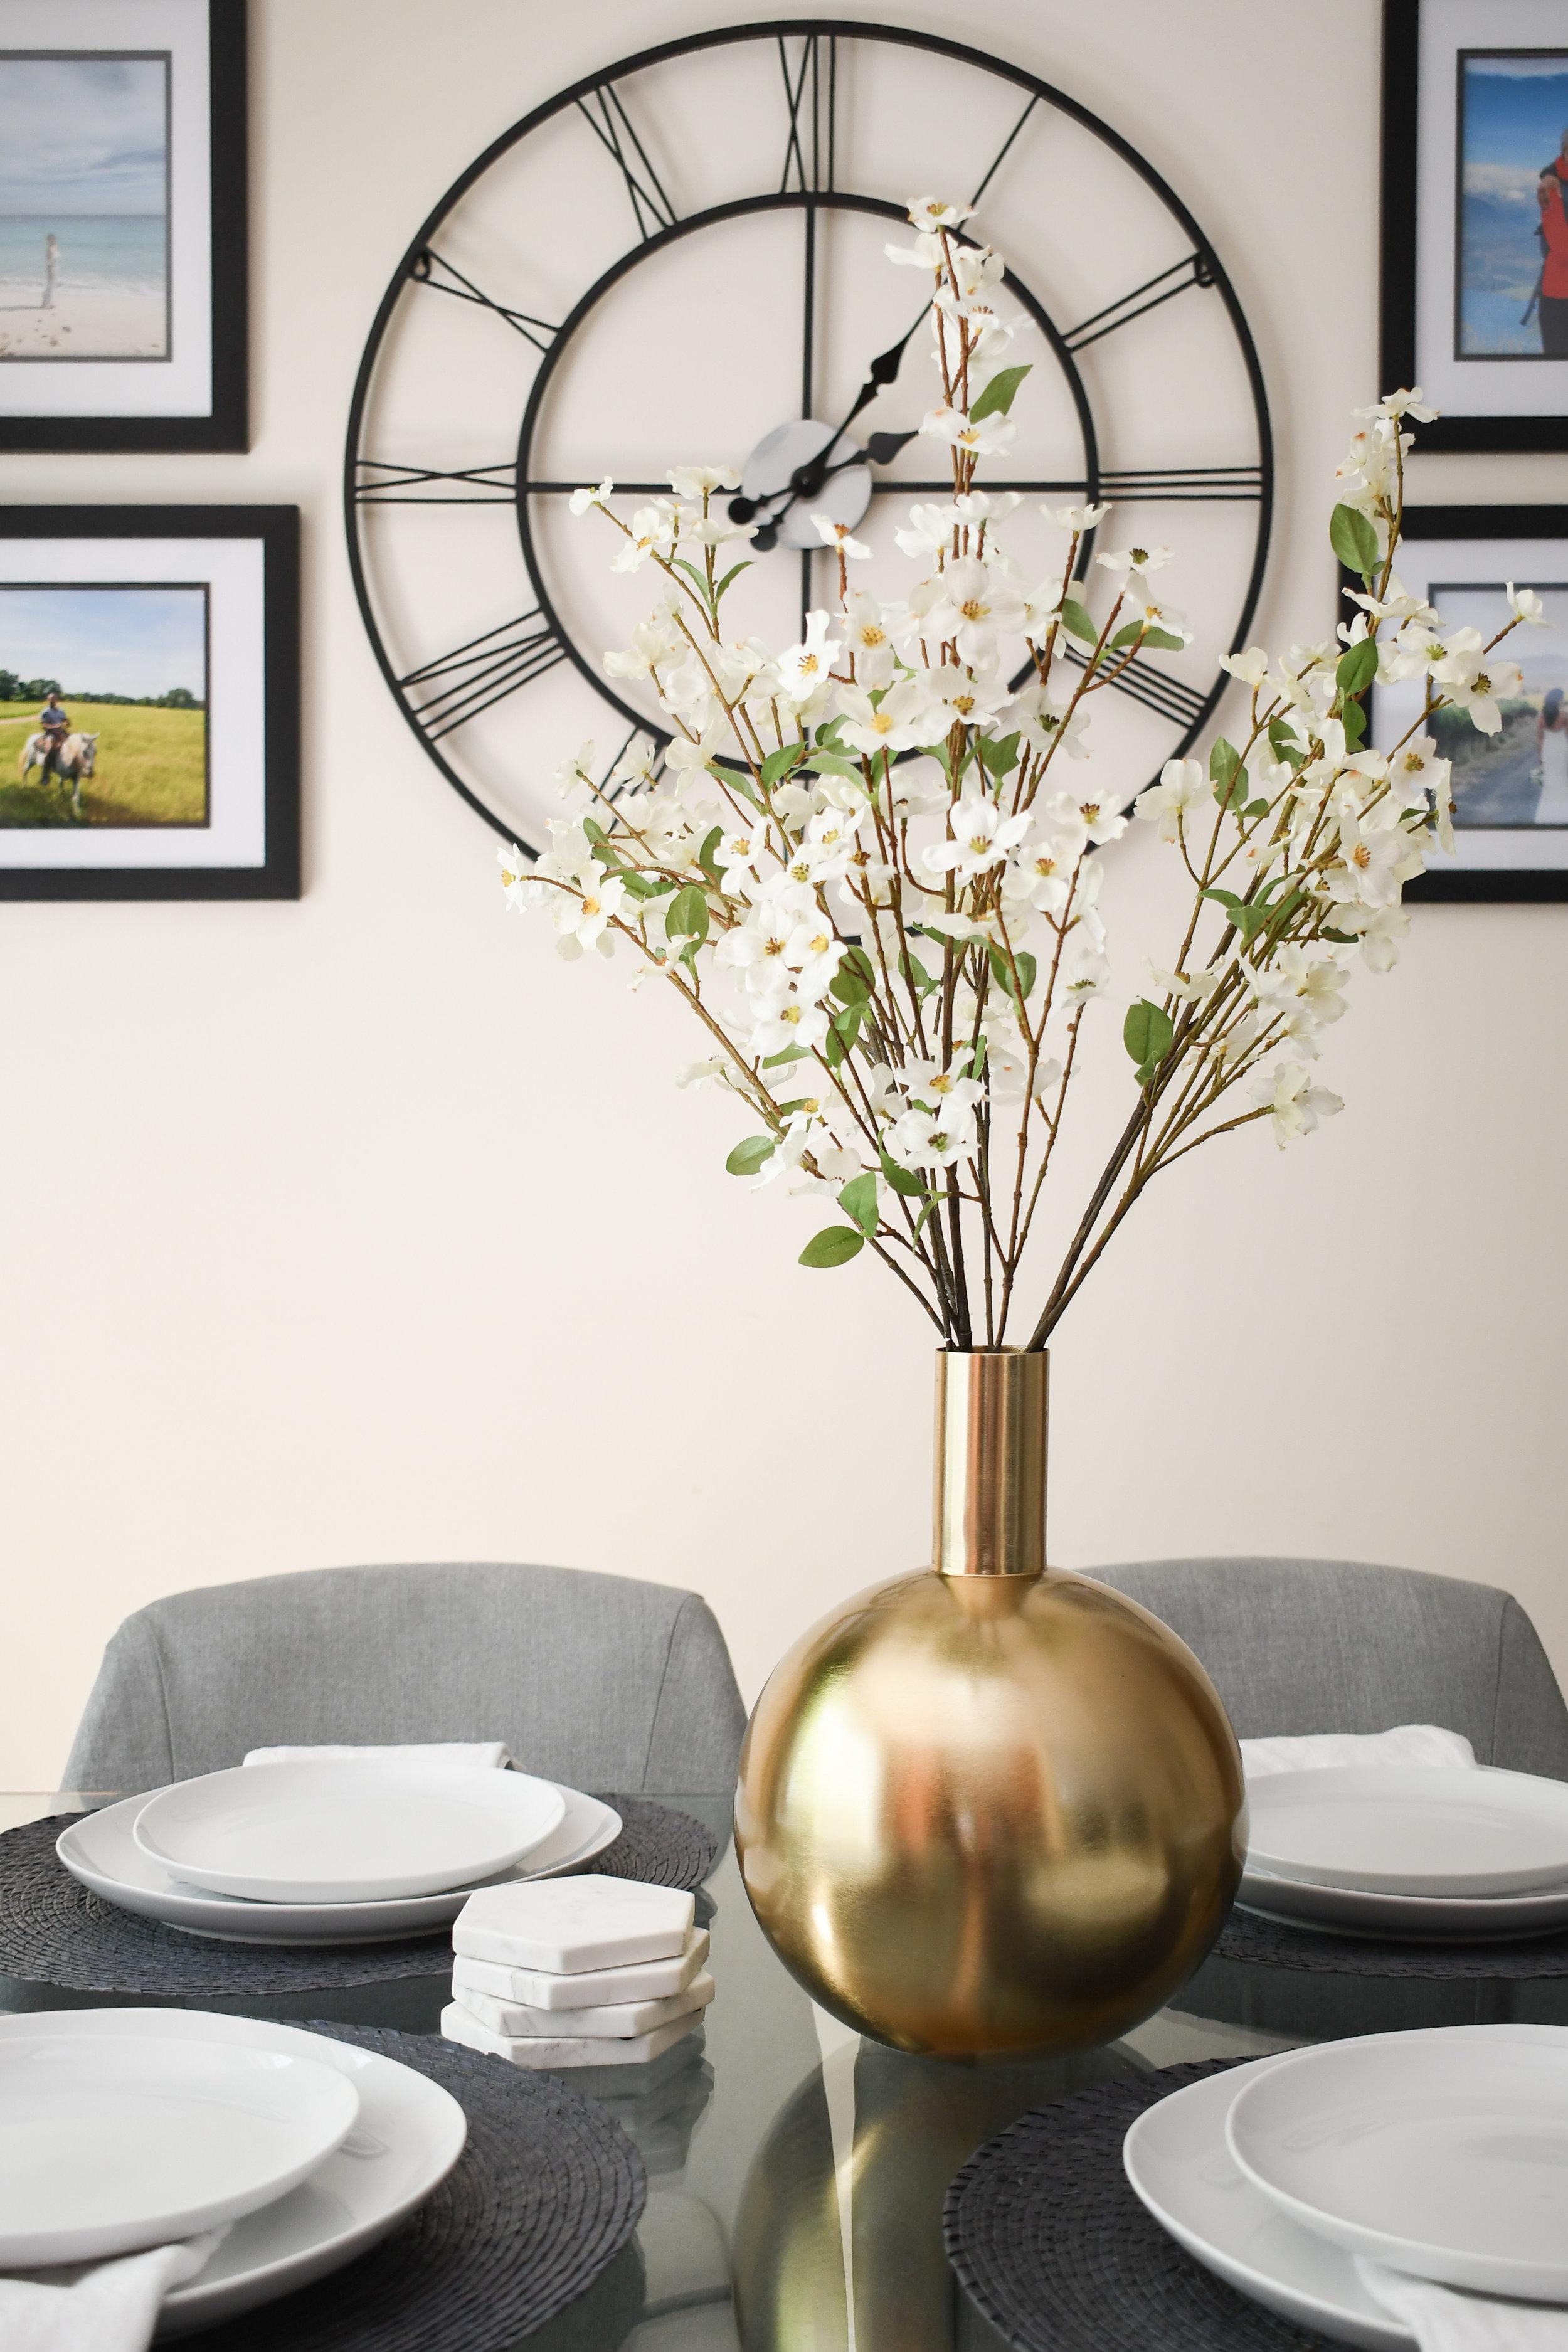 Angela Grace Design - Creekside Dining Room - San Francisco and SF Bay Area Interior Designer, Decorator